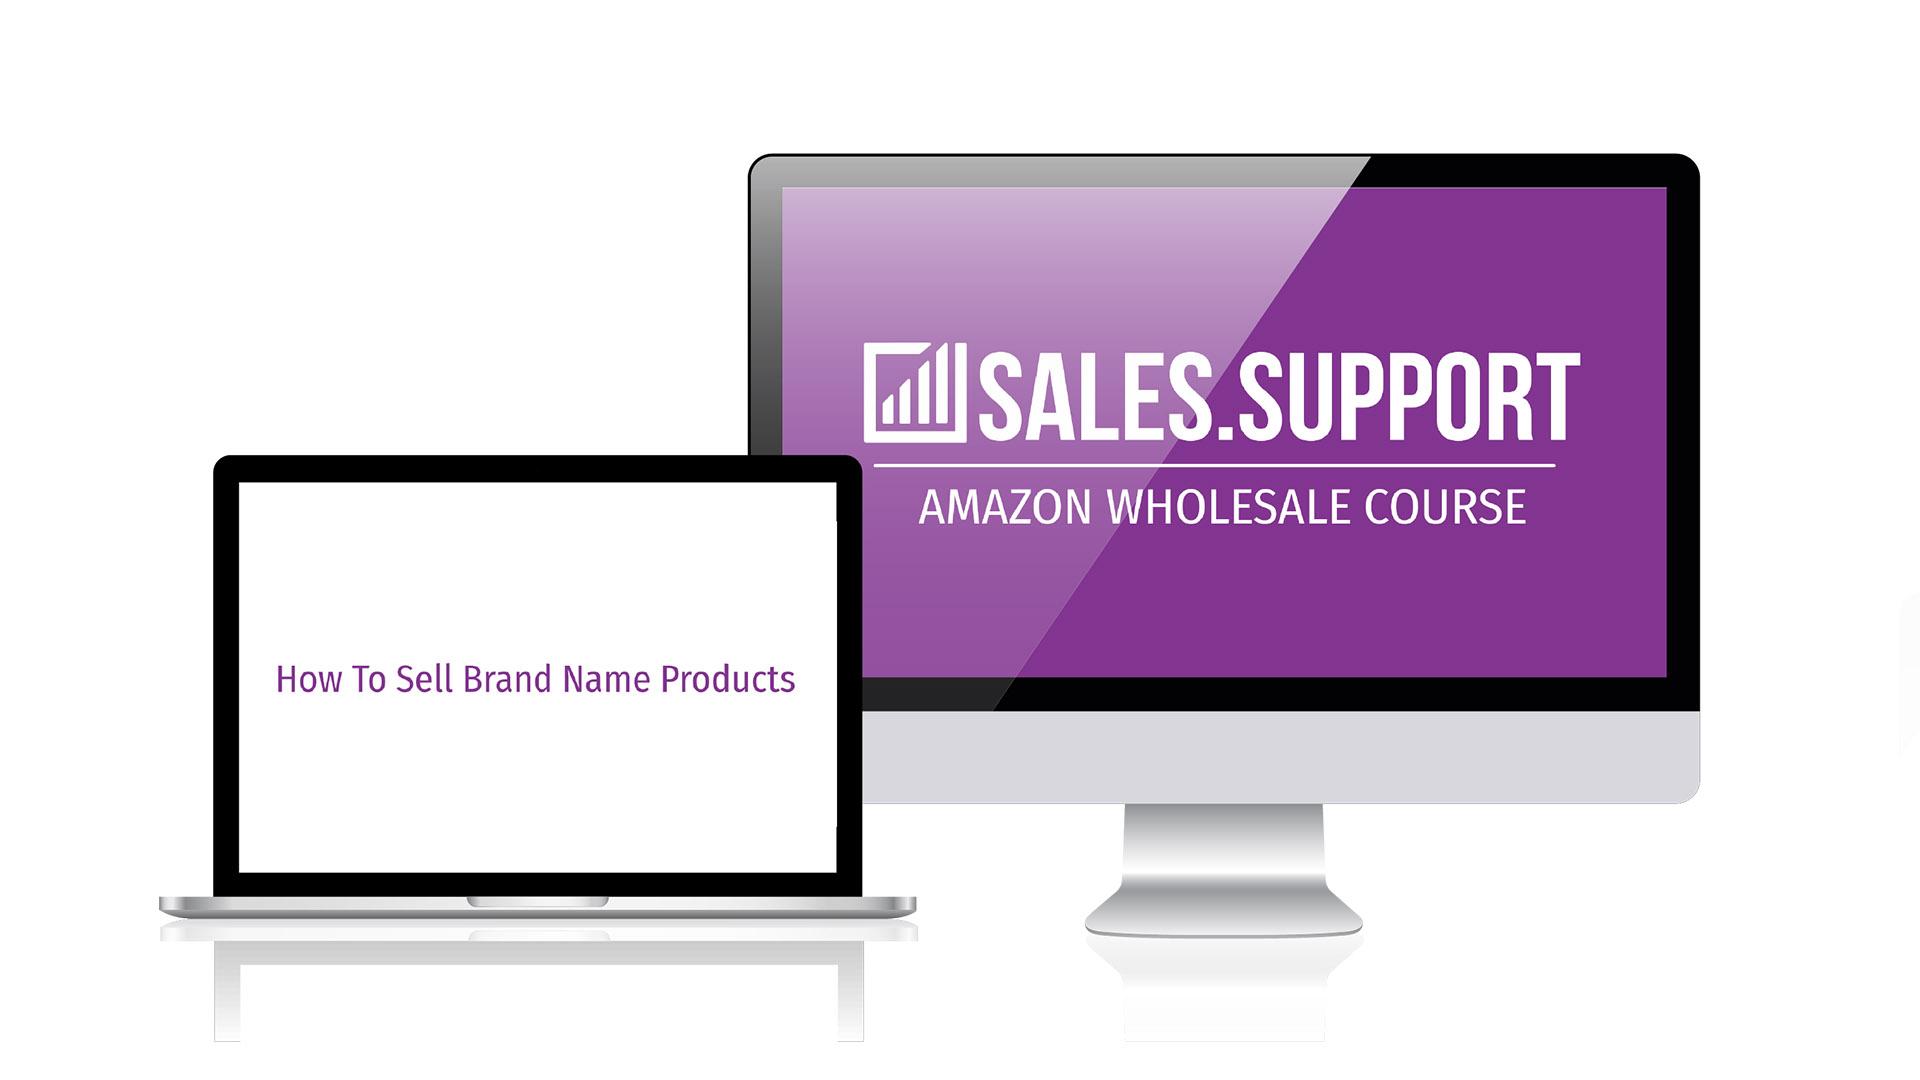 Amazon Wholesale Course